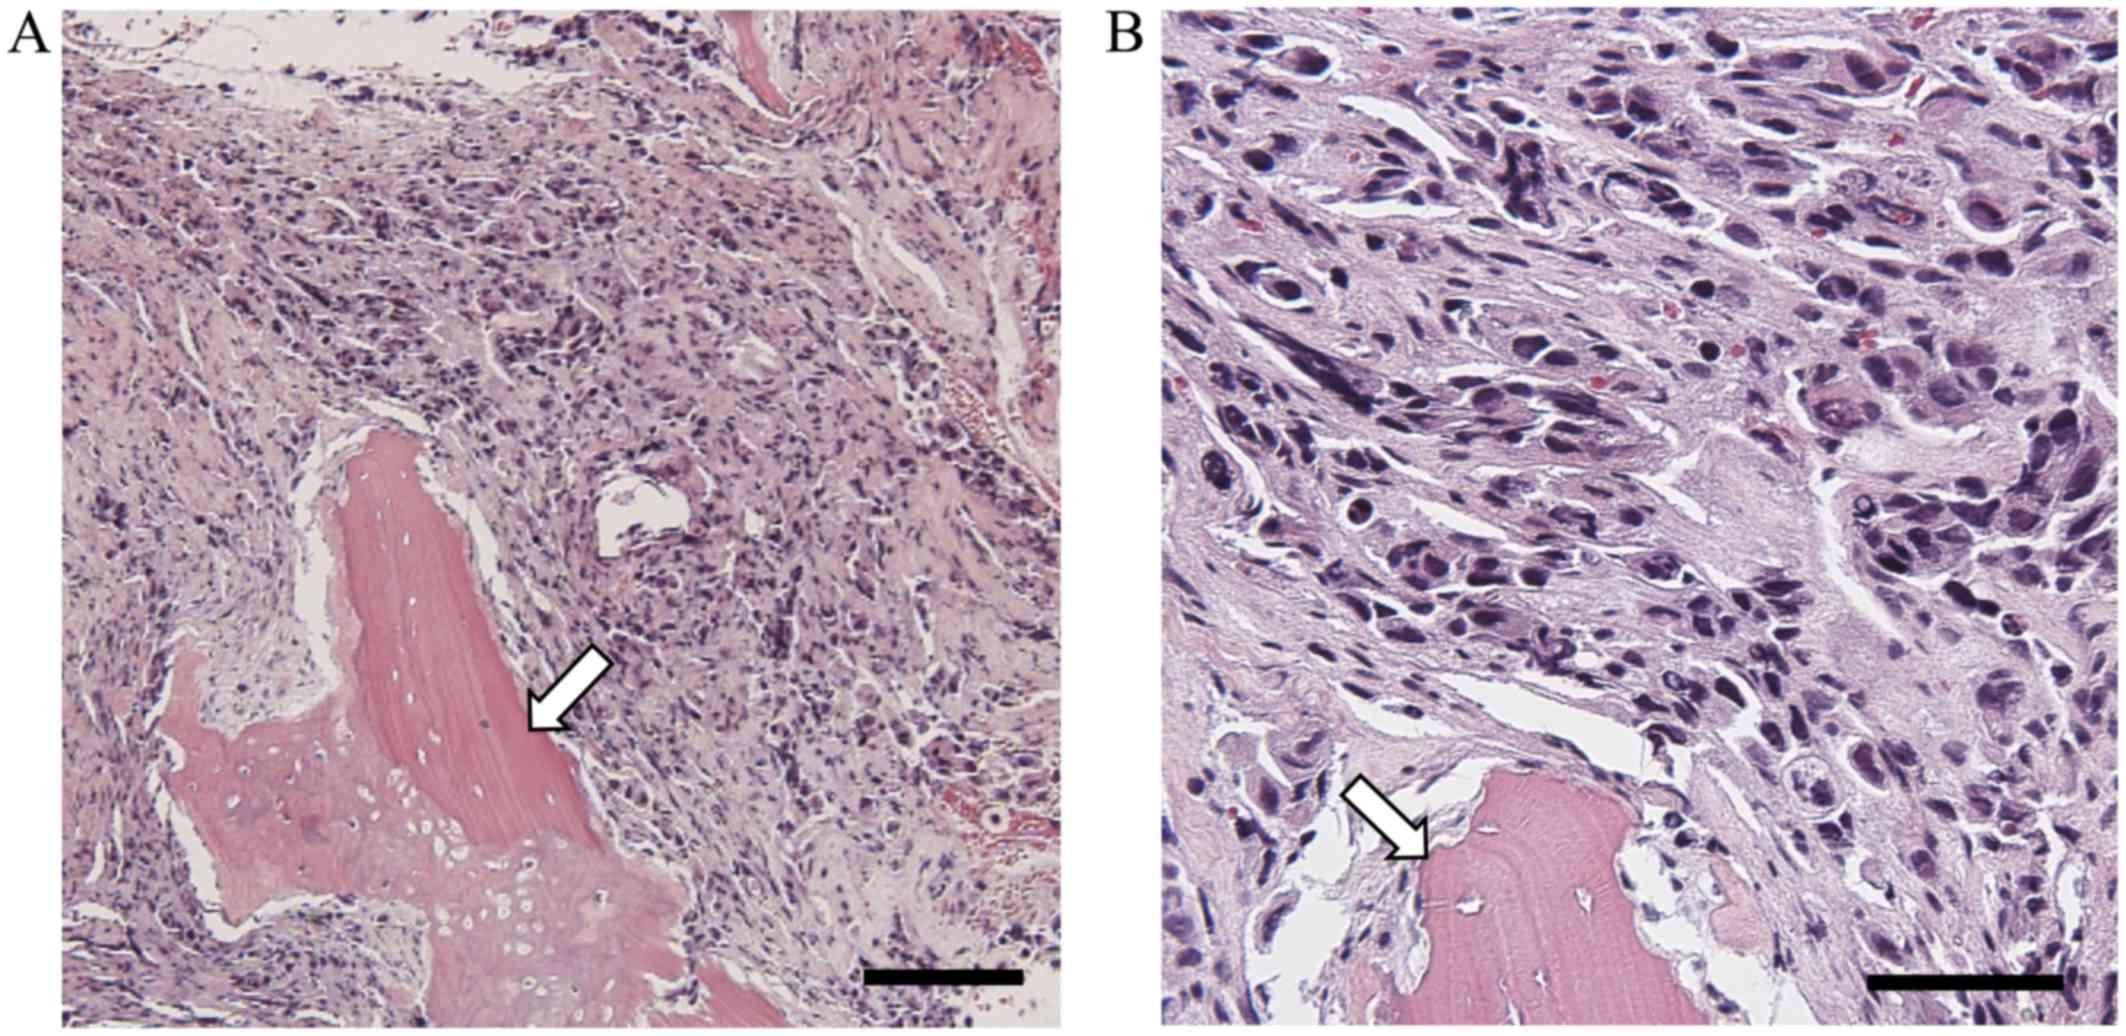 Breast cancer and bone marrow